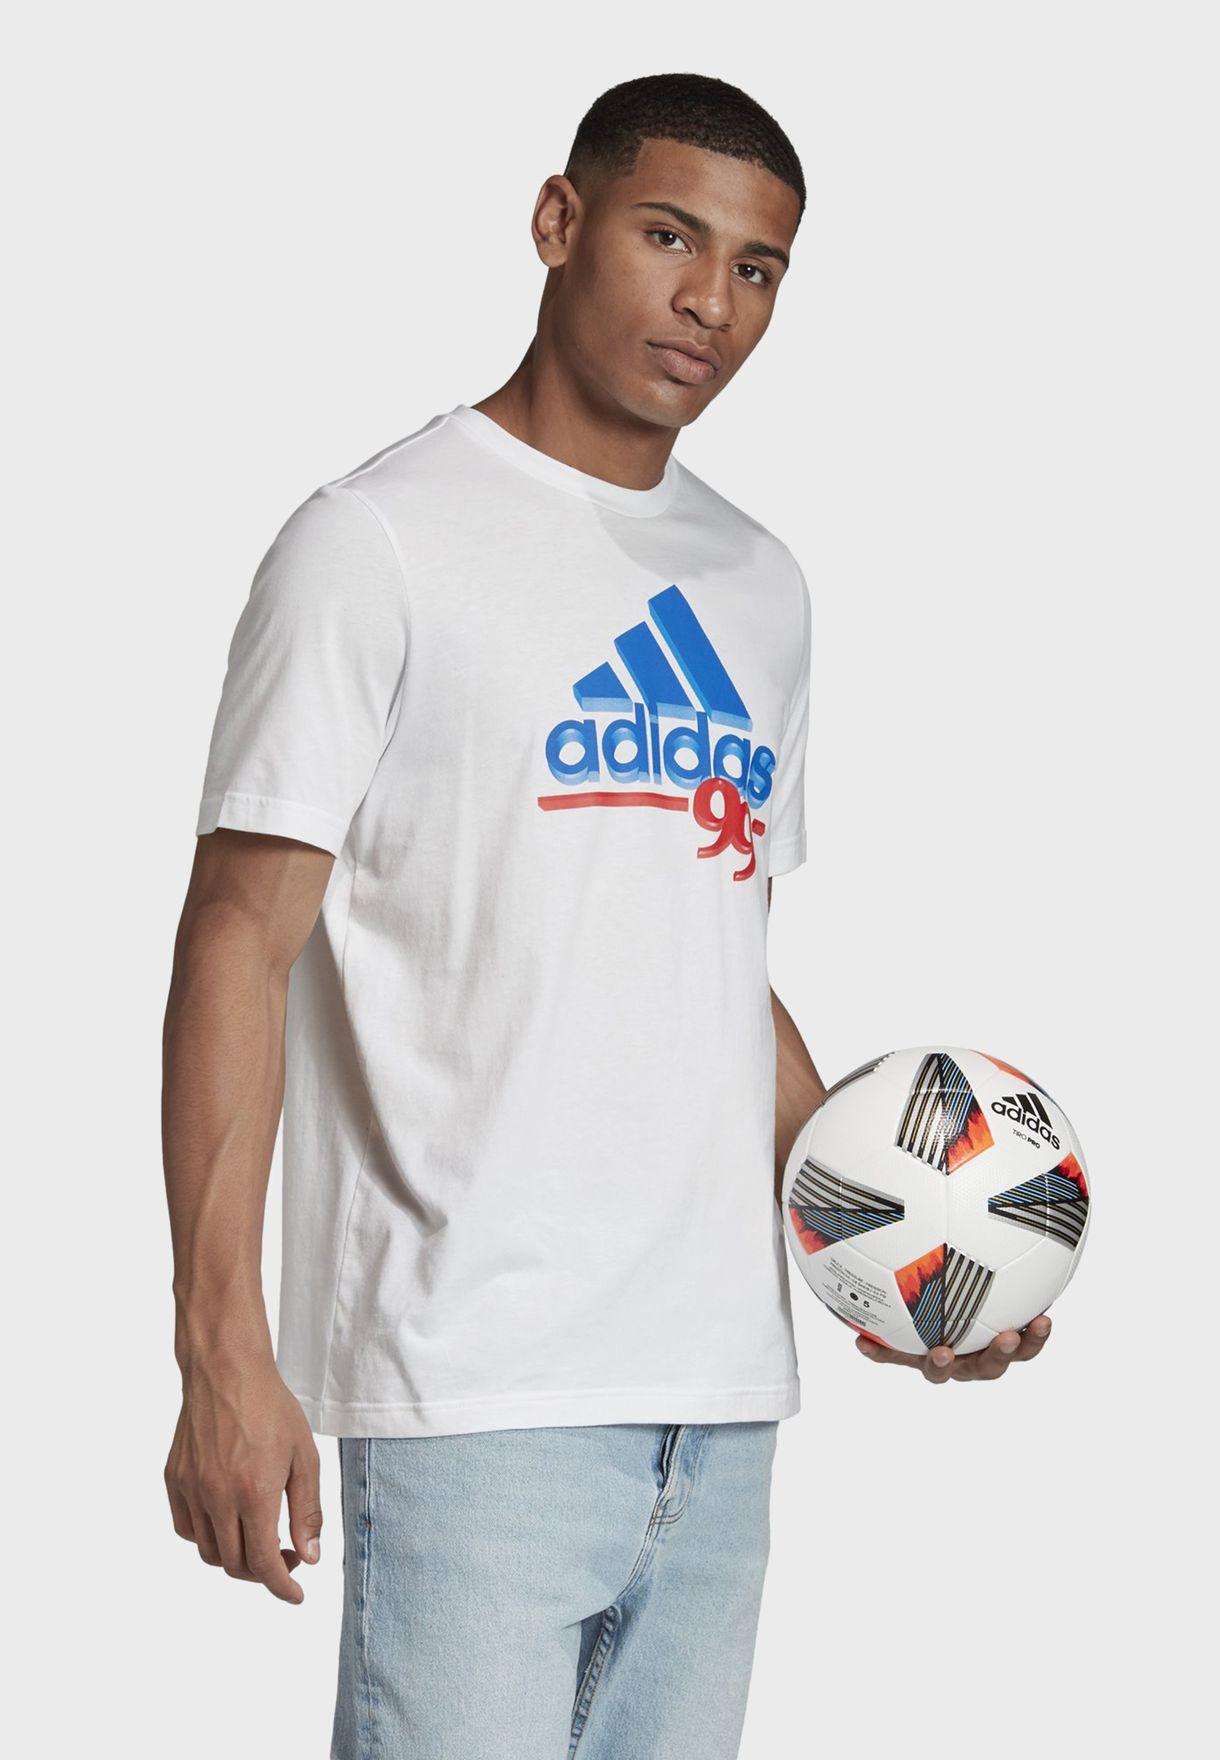 Video Game BOS T-Shirt